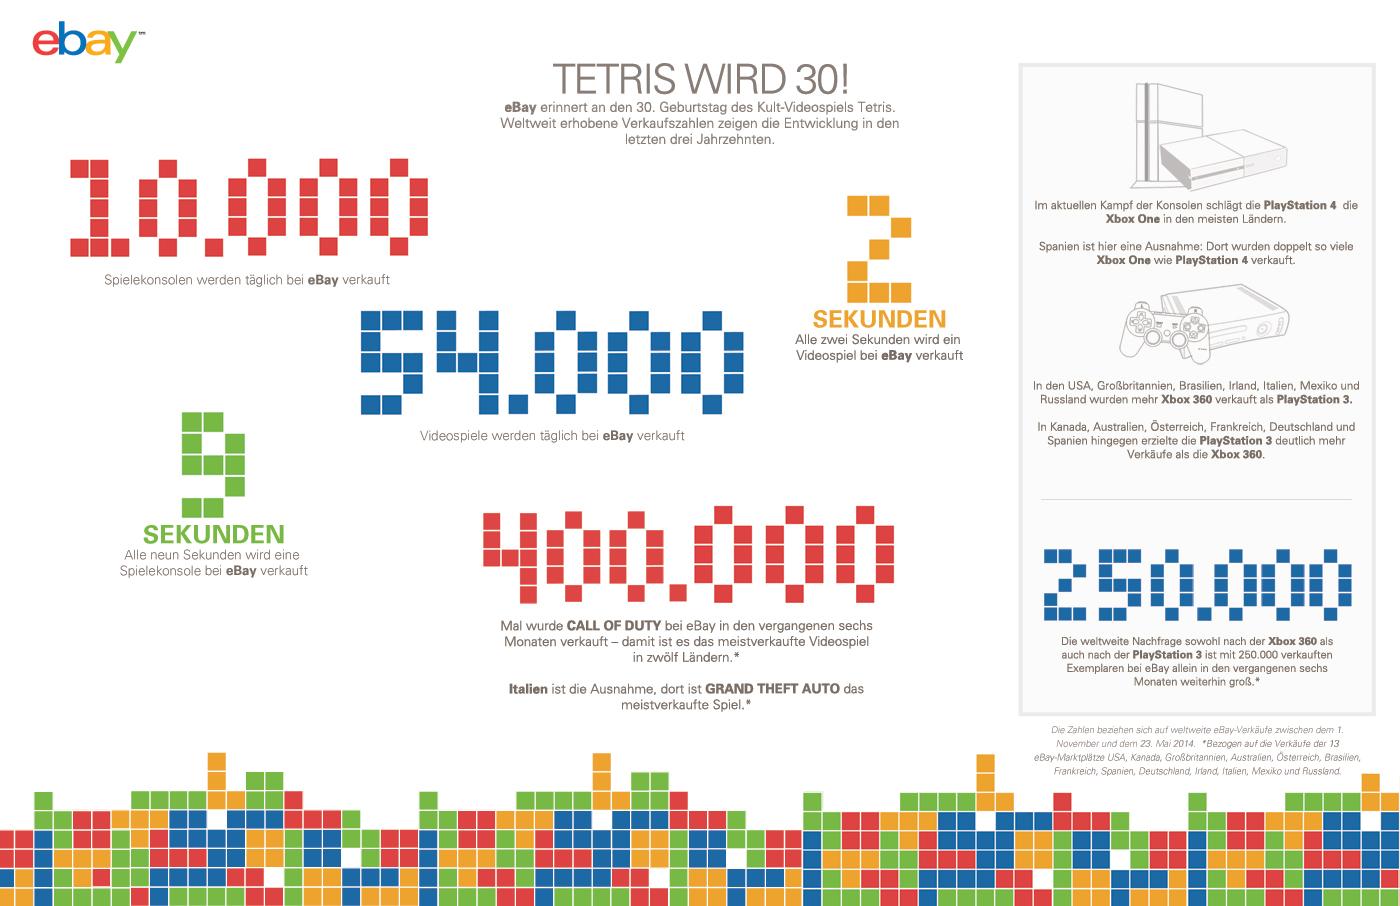 eBay Verkaufszahlen Tetris